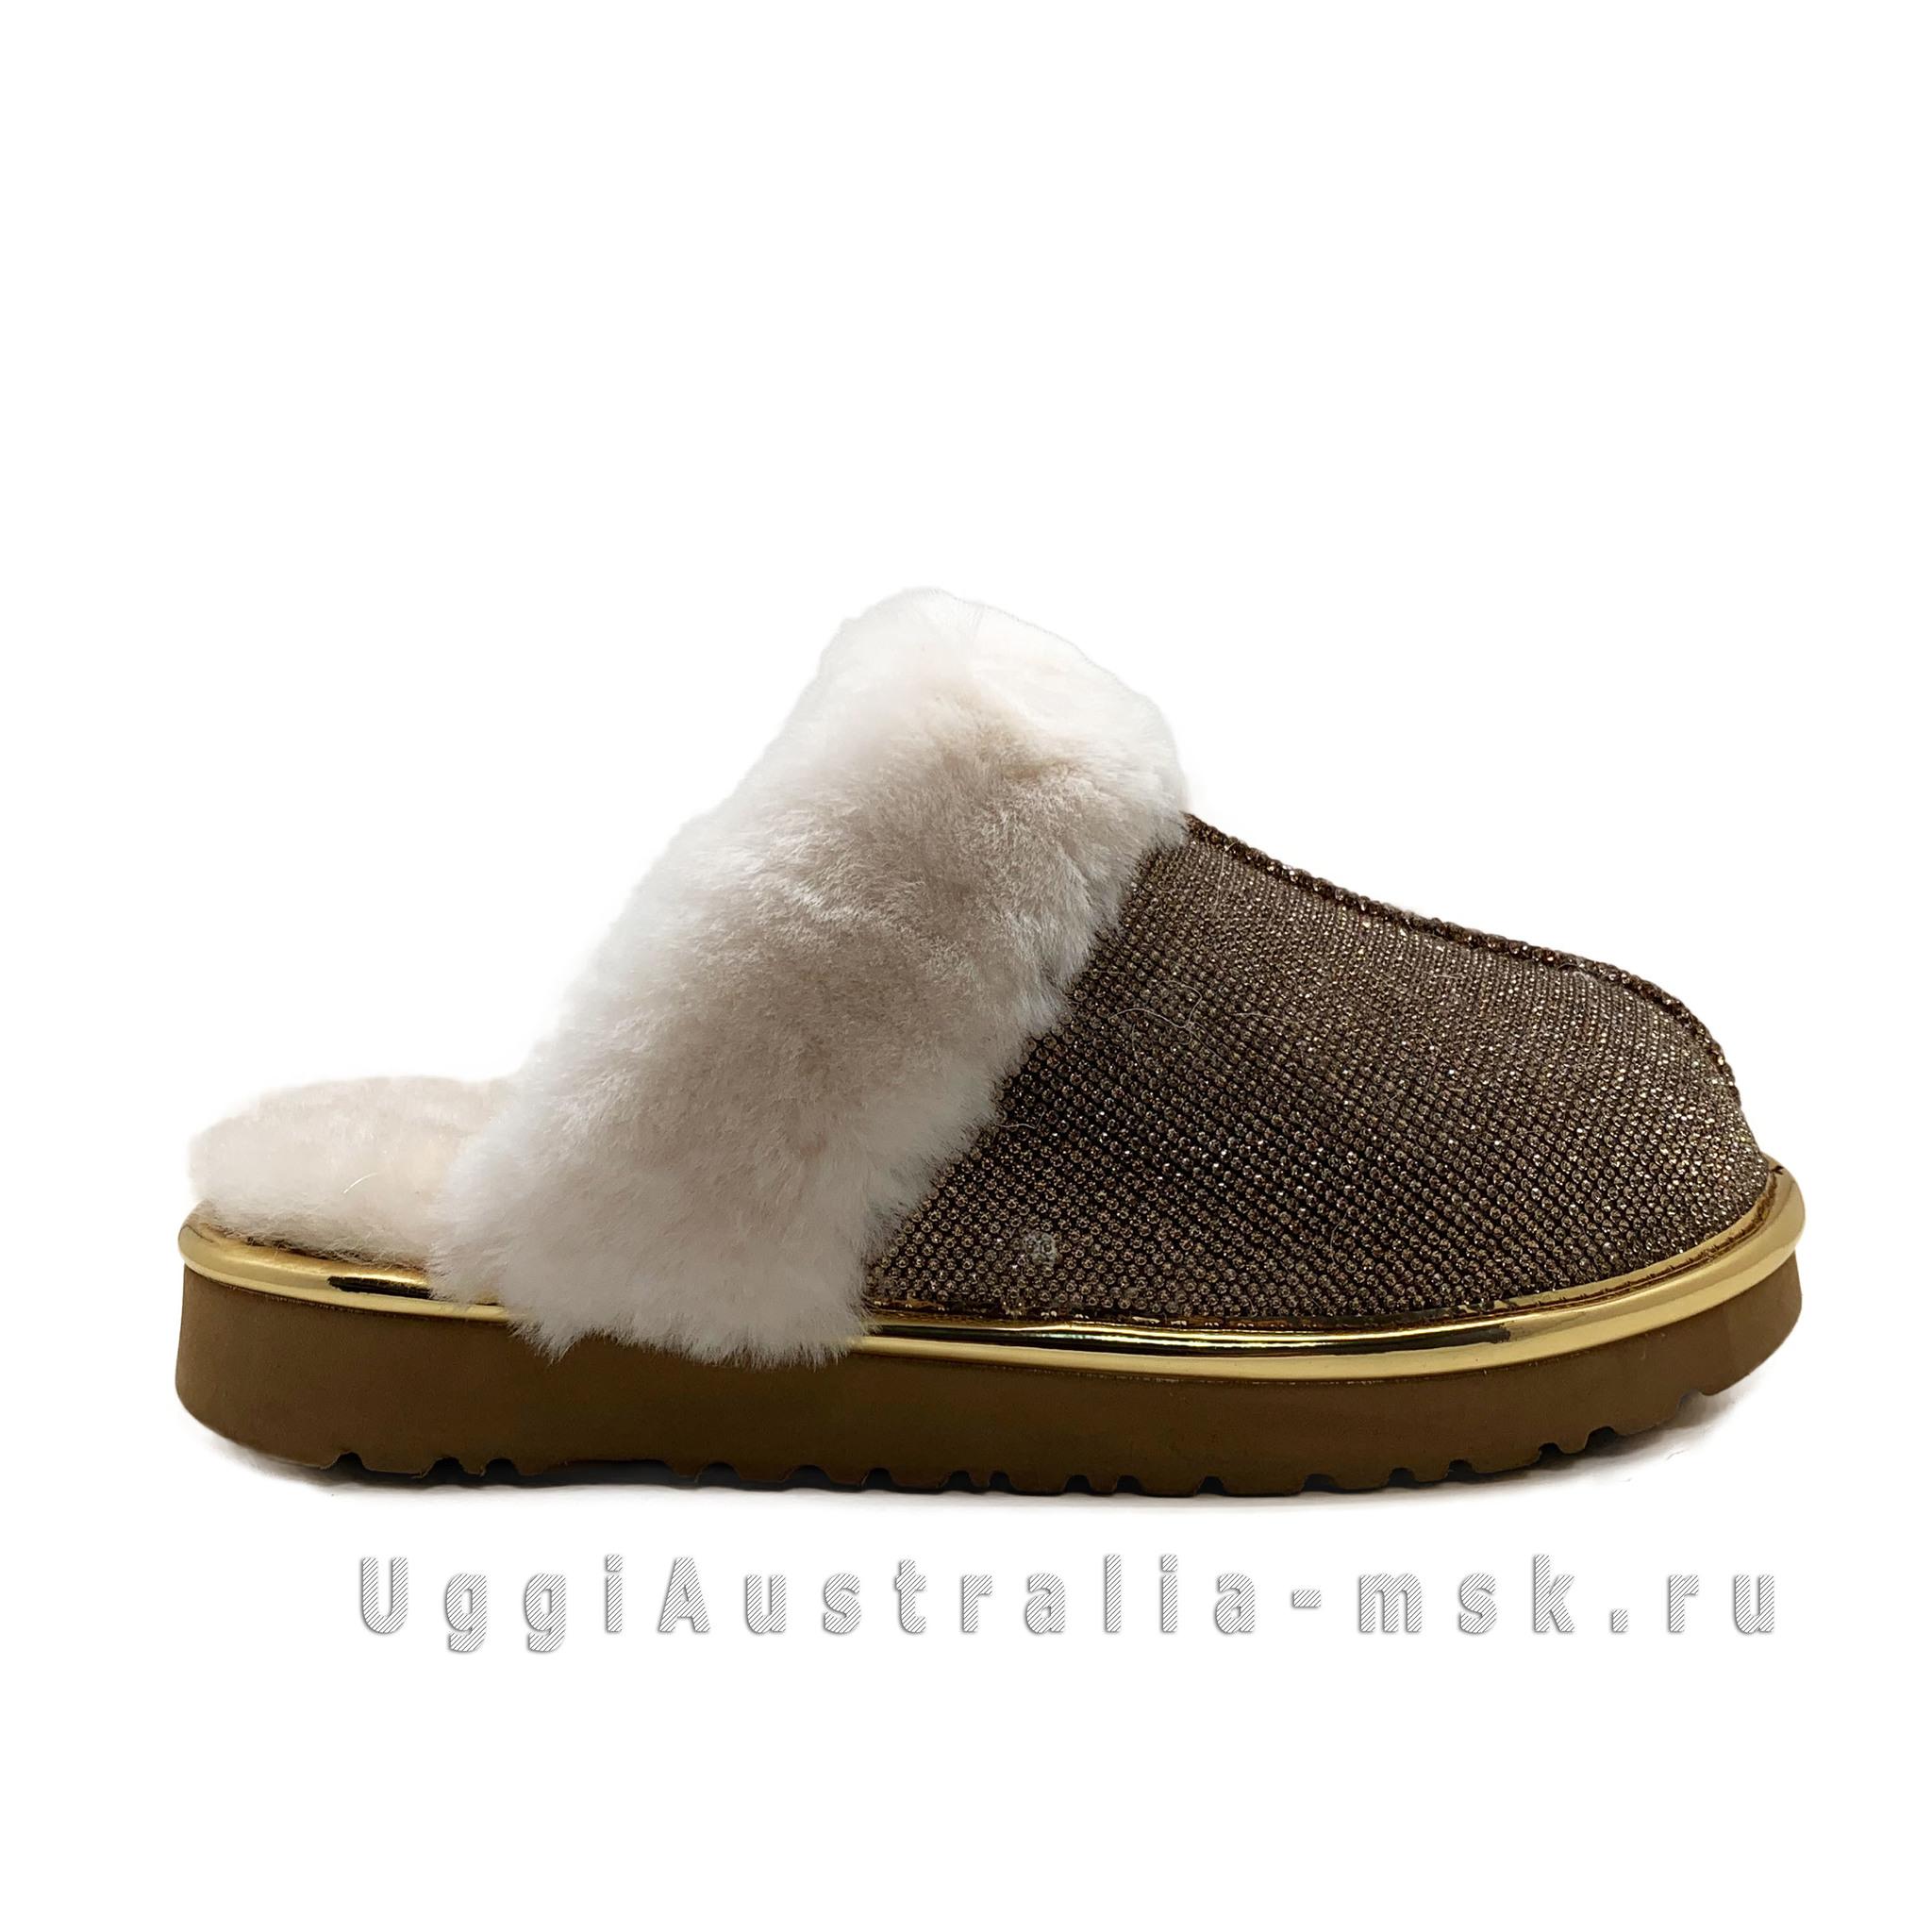 UGG Slipper Serein Chestnut